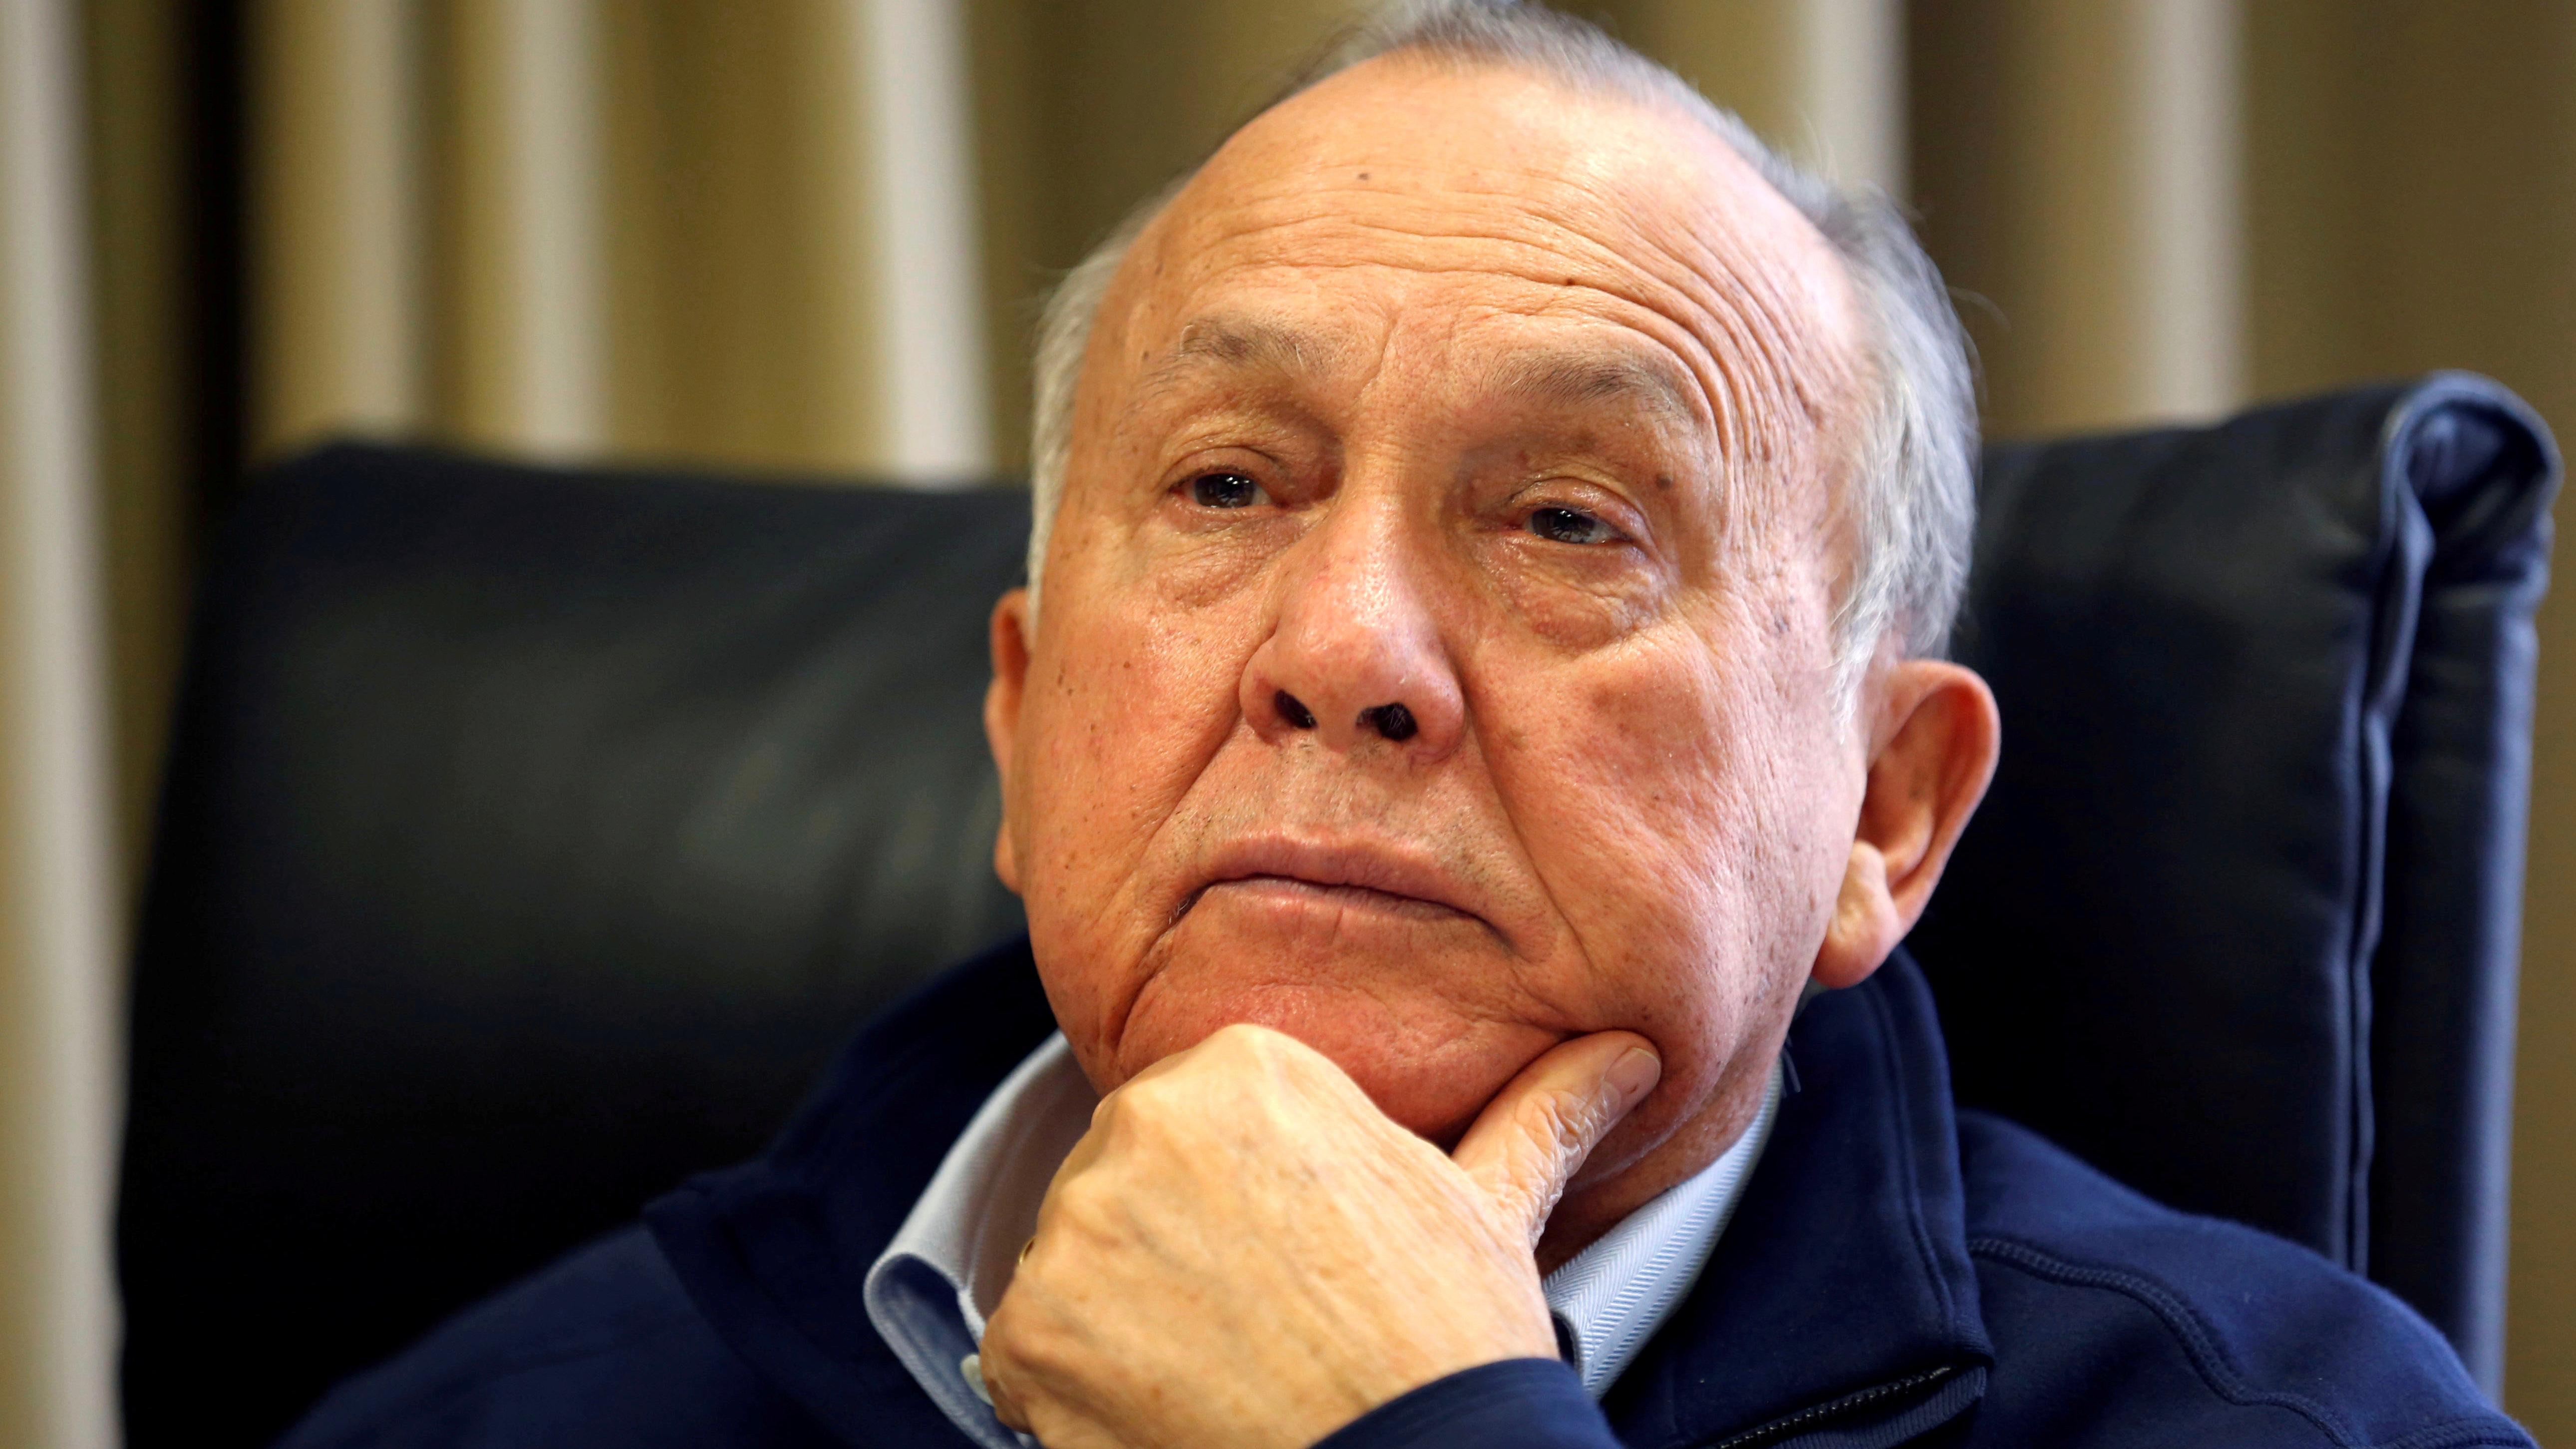 Steinhoff scandal wipes nearly $3 billion off Christo Wiese's personal wealth